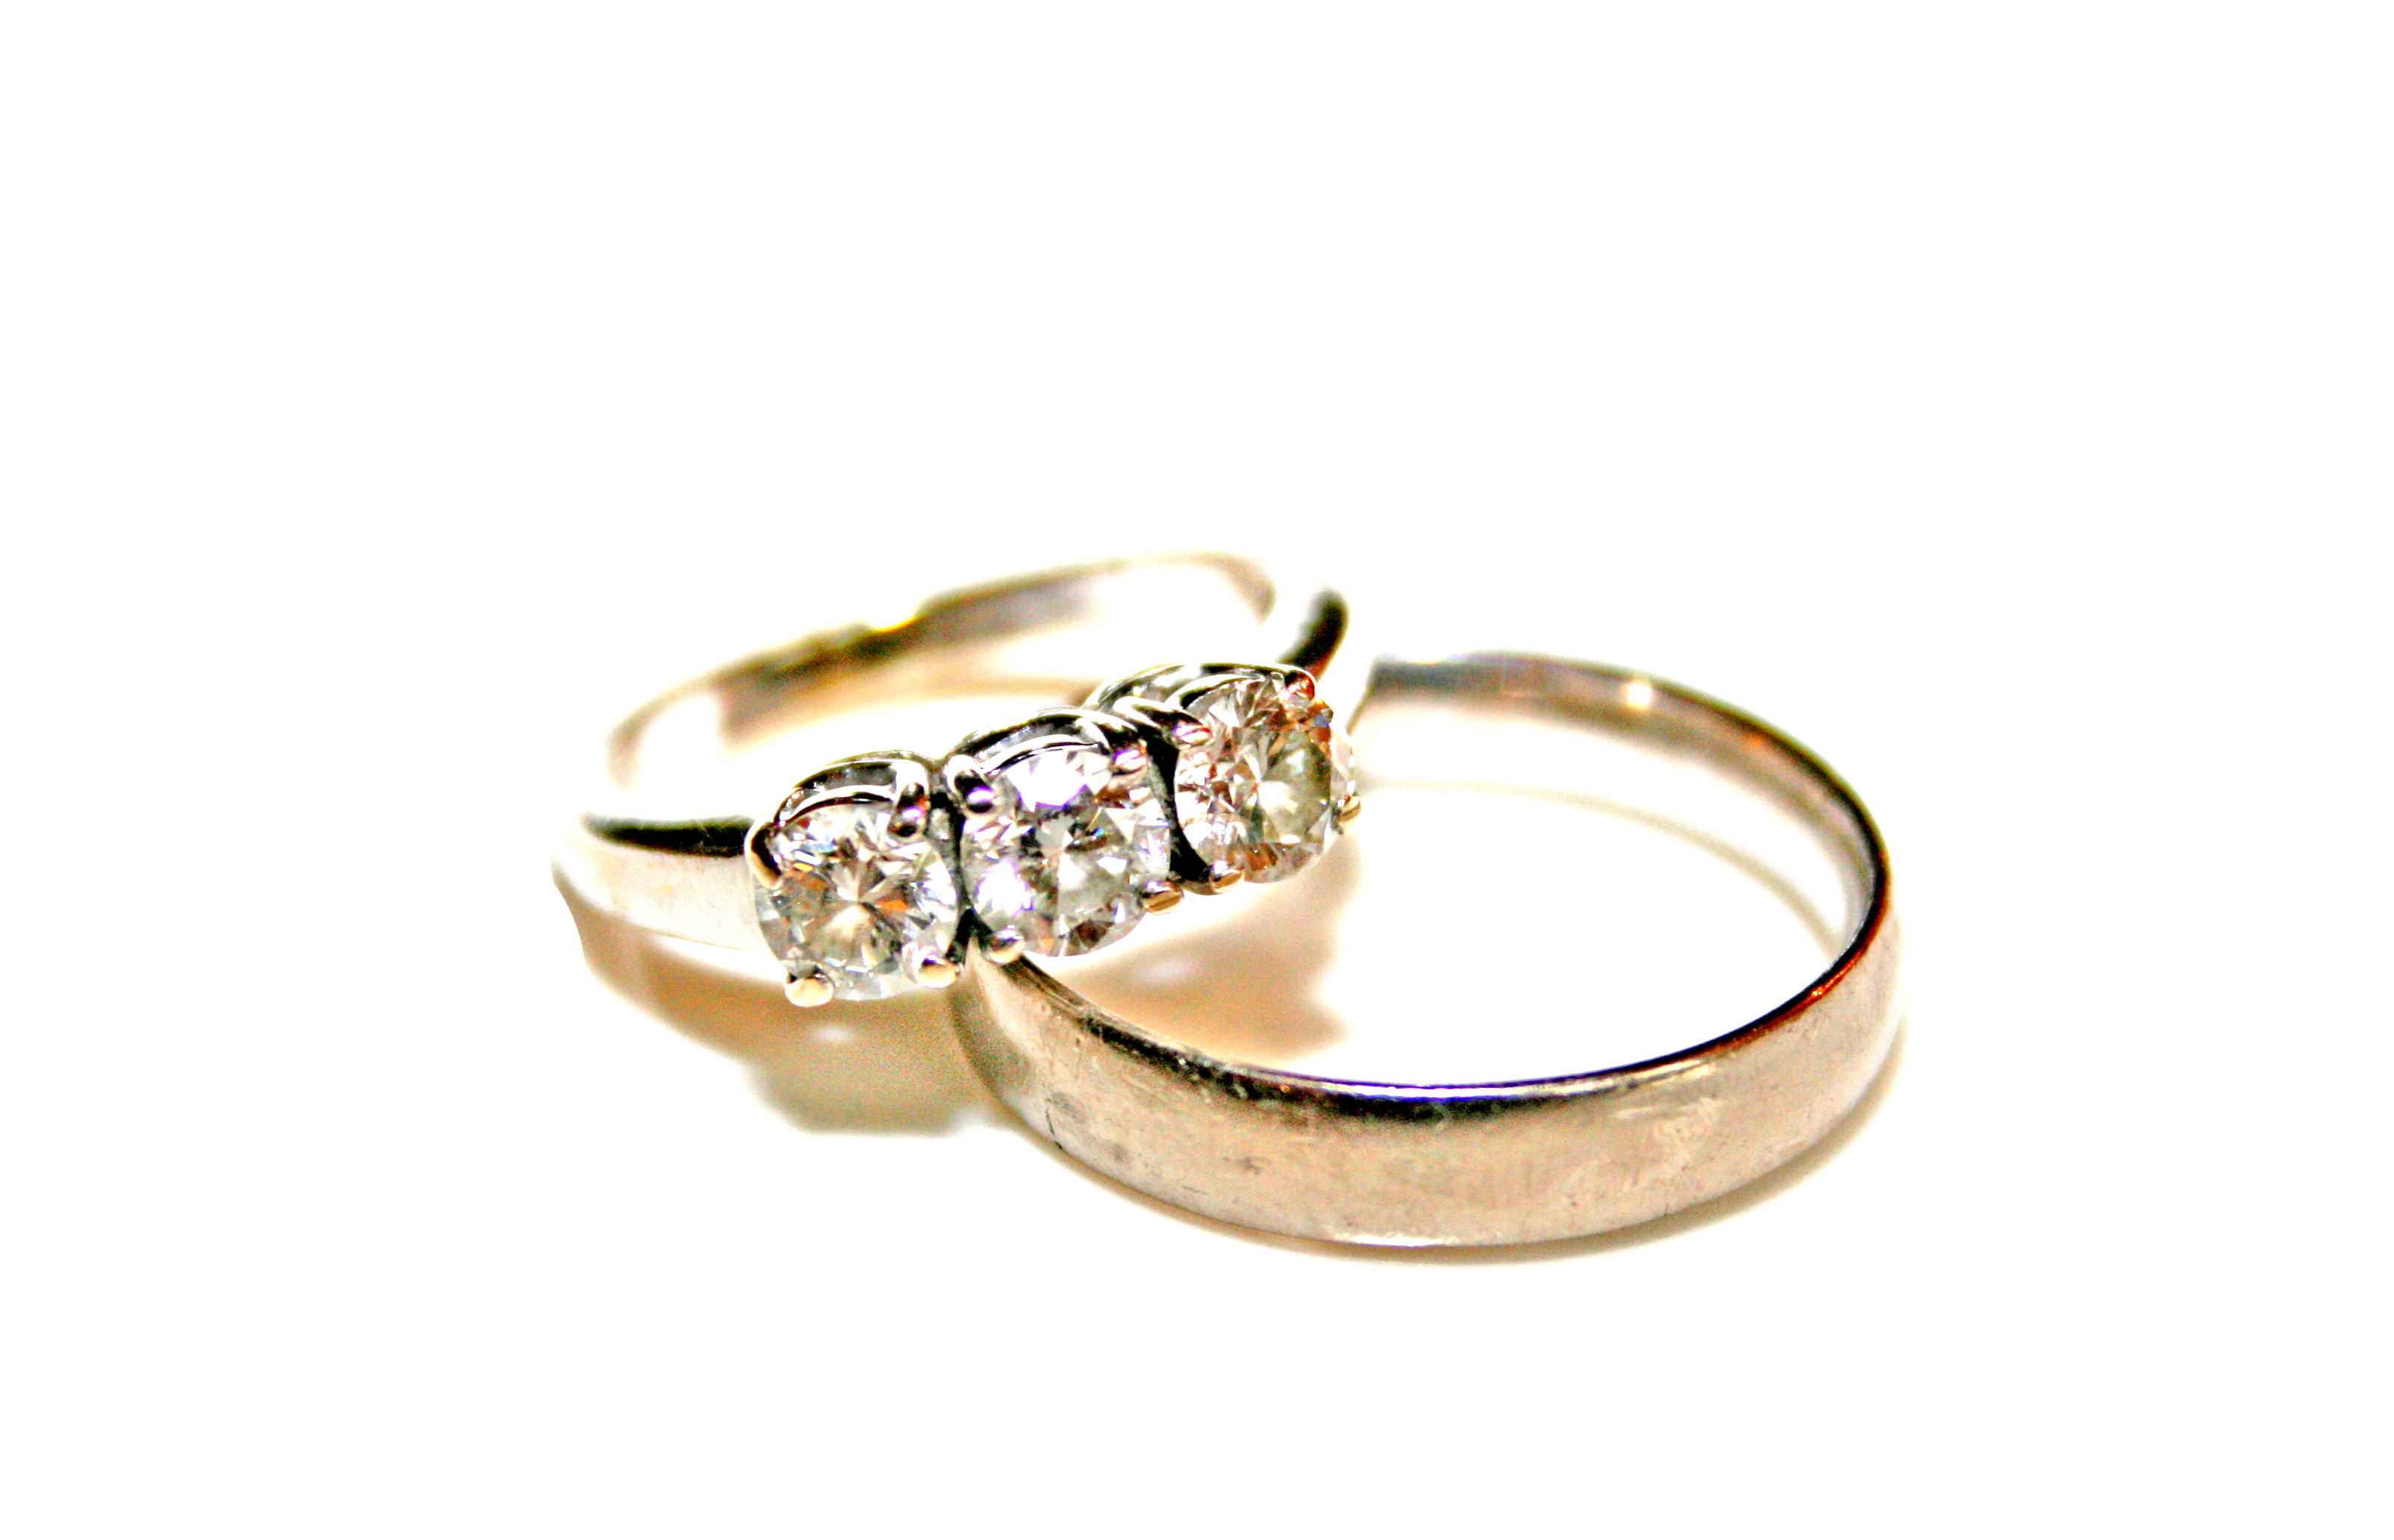 File:Wedding rings photo by Litho Printers pictures of wedding rings File Wedding rings photo by Litho Printers